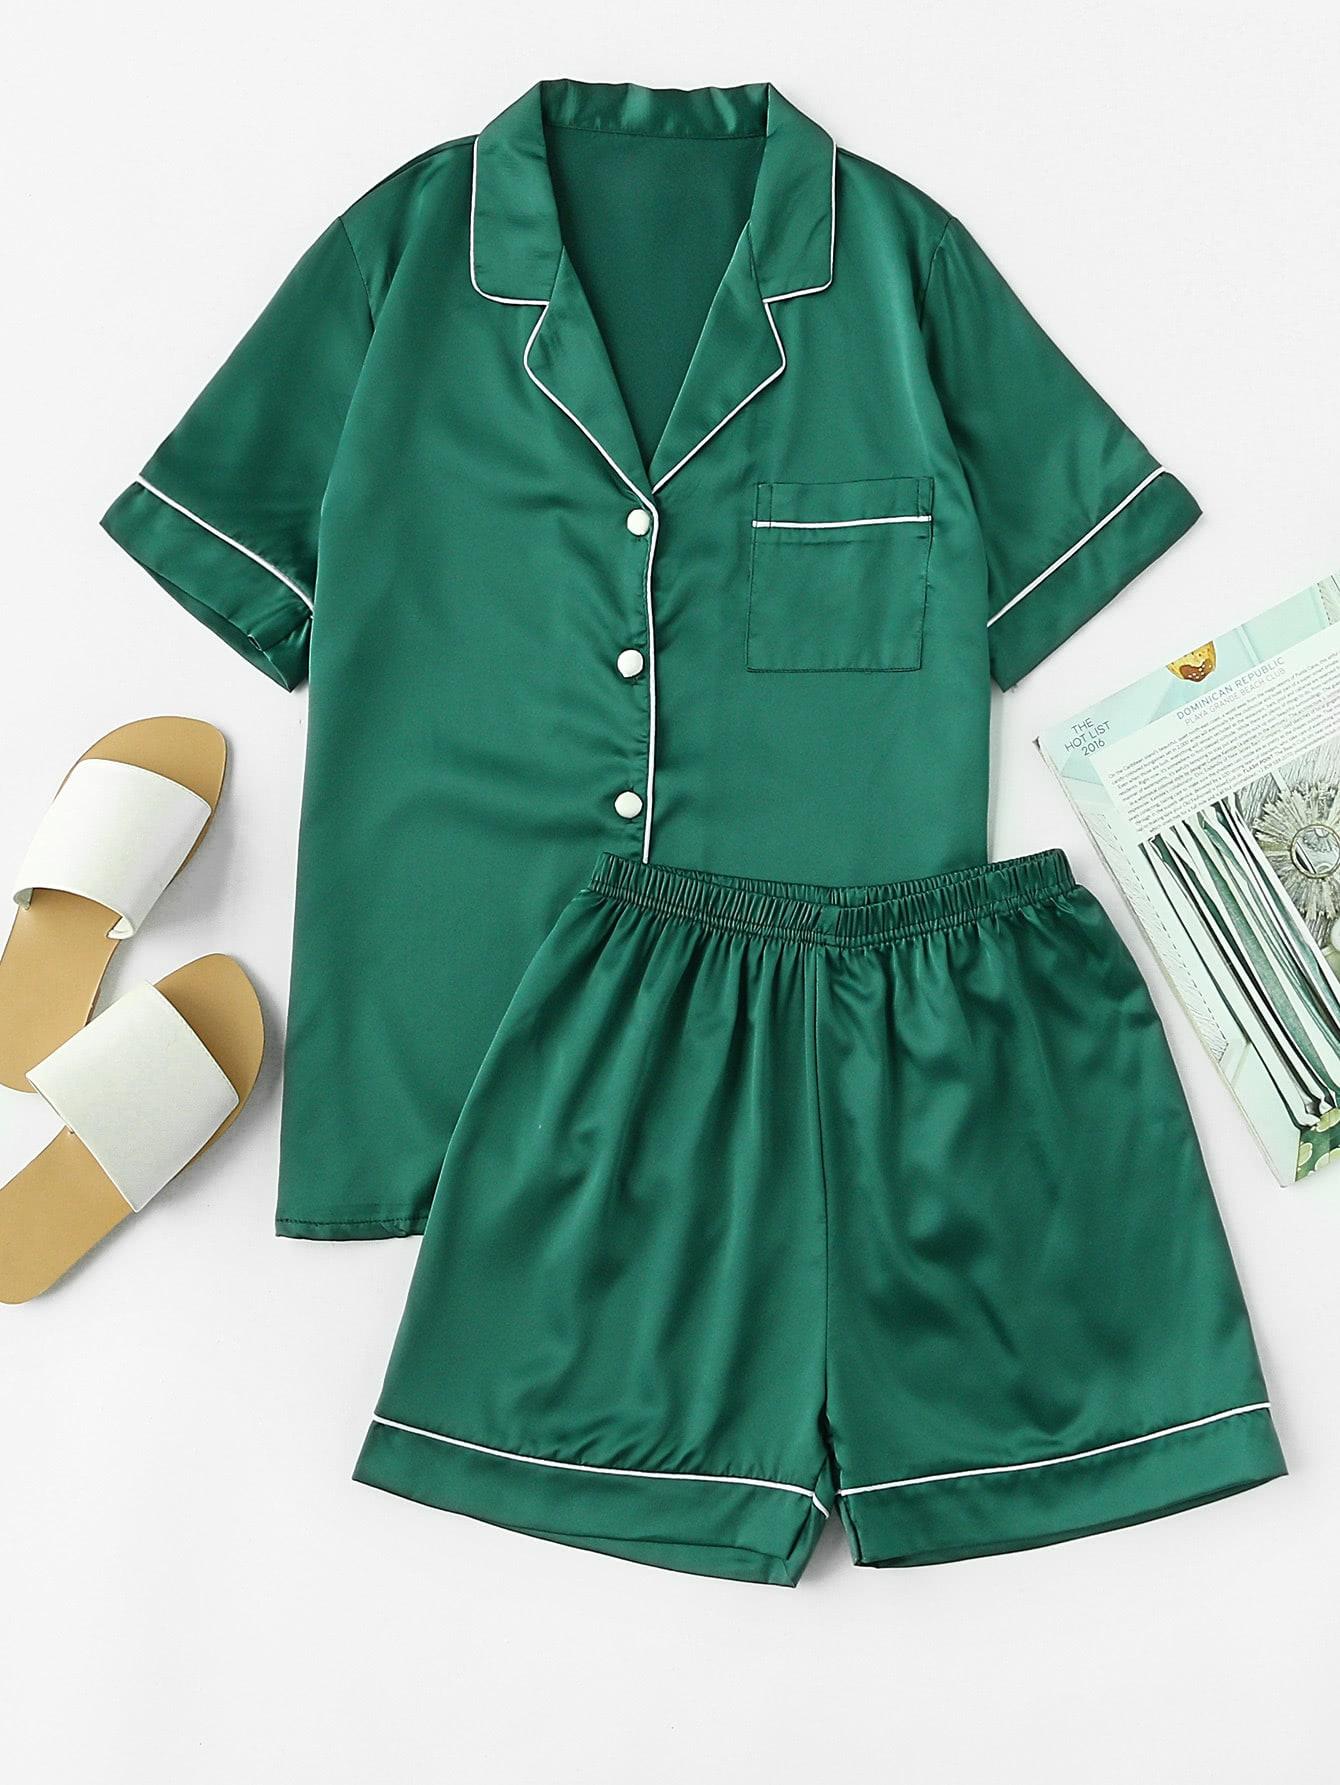 US1900 Contrast Piping Striped Shirt u0026 Shorts